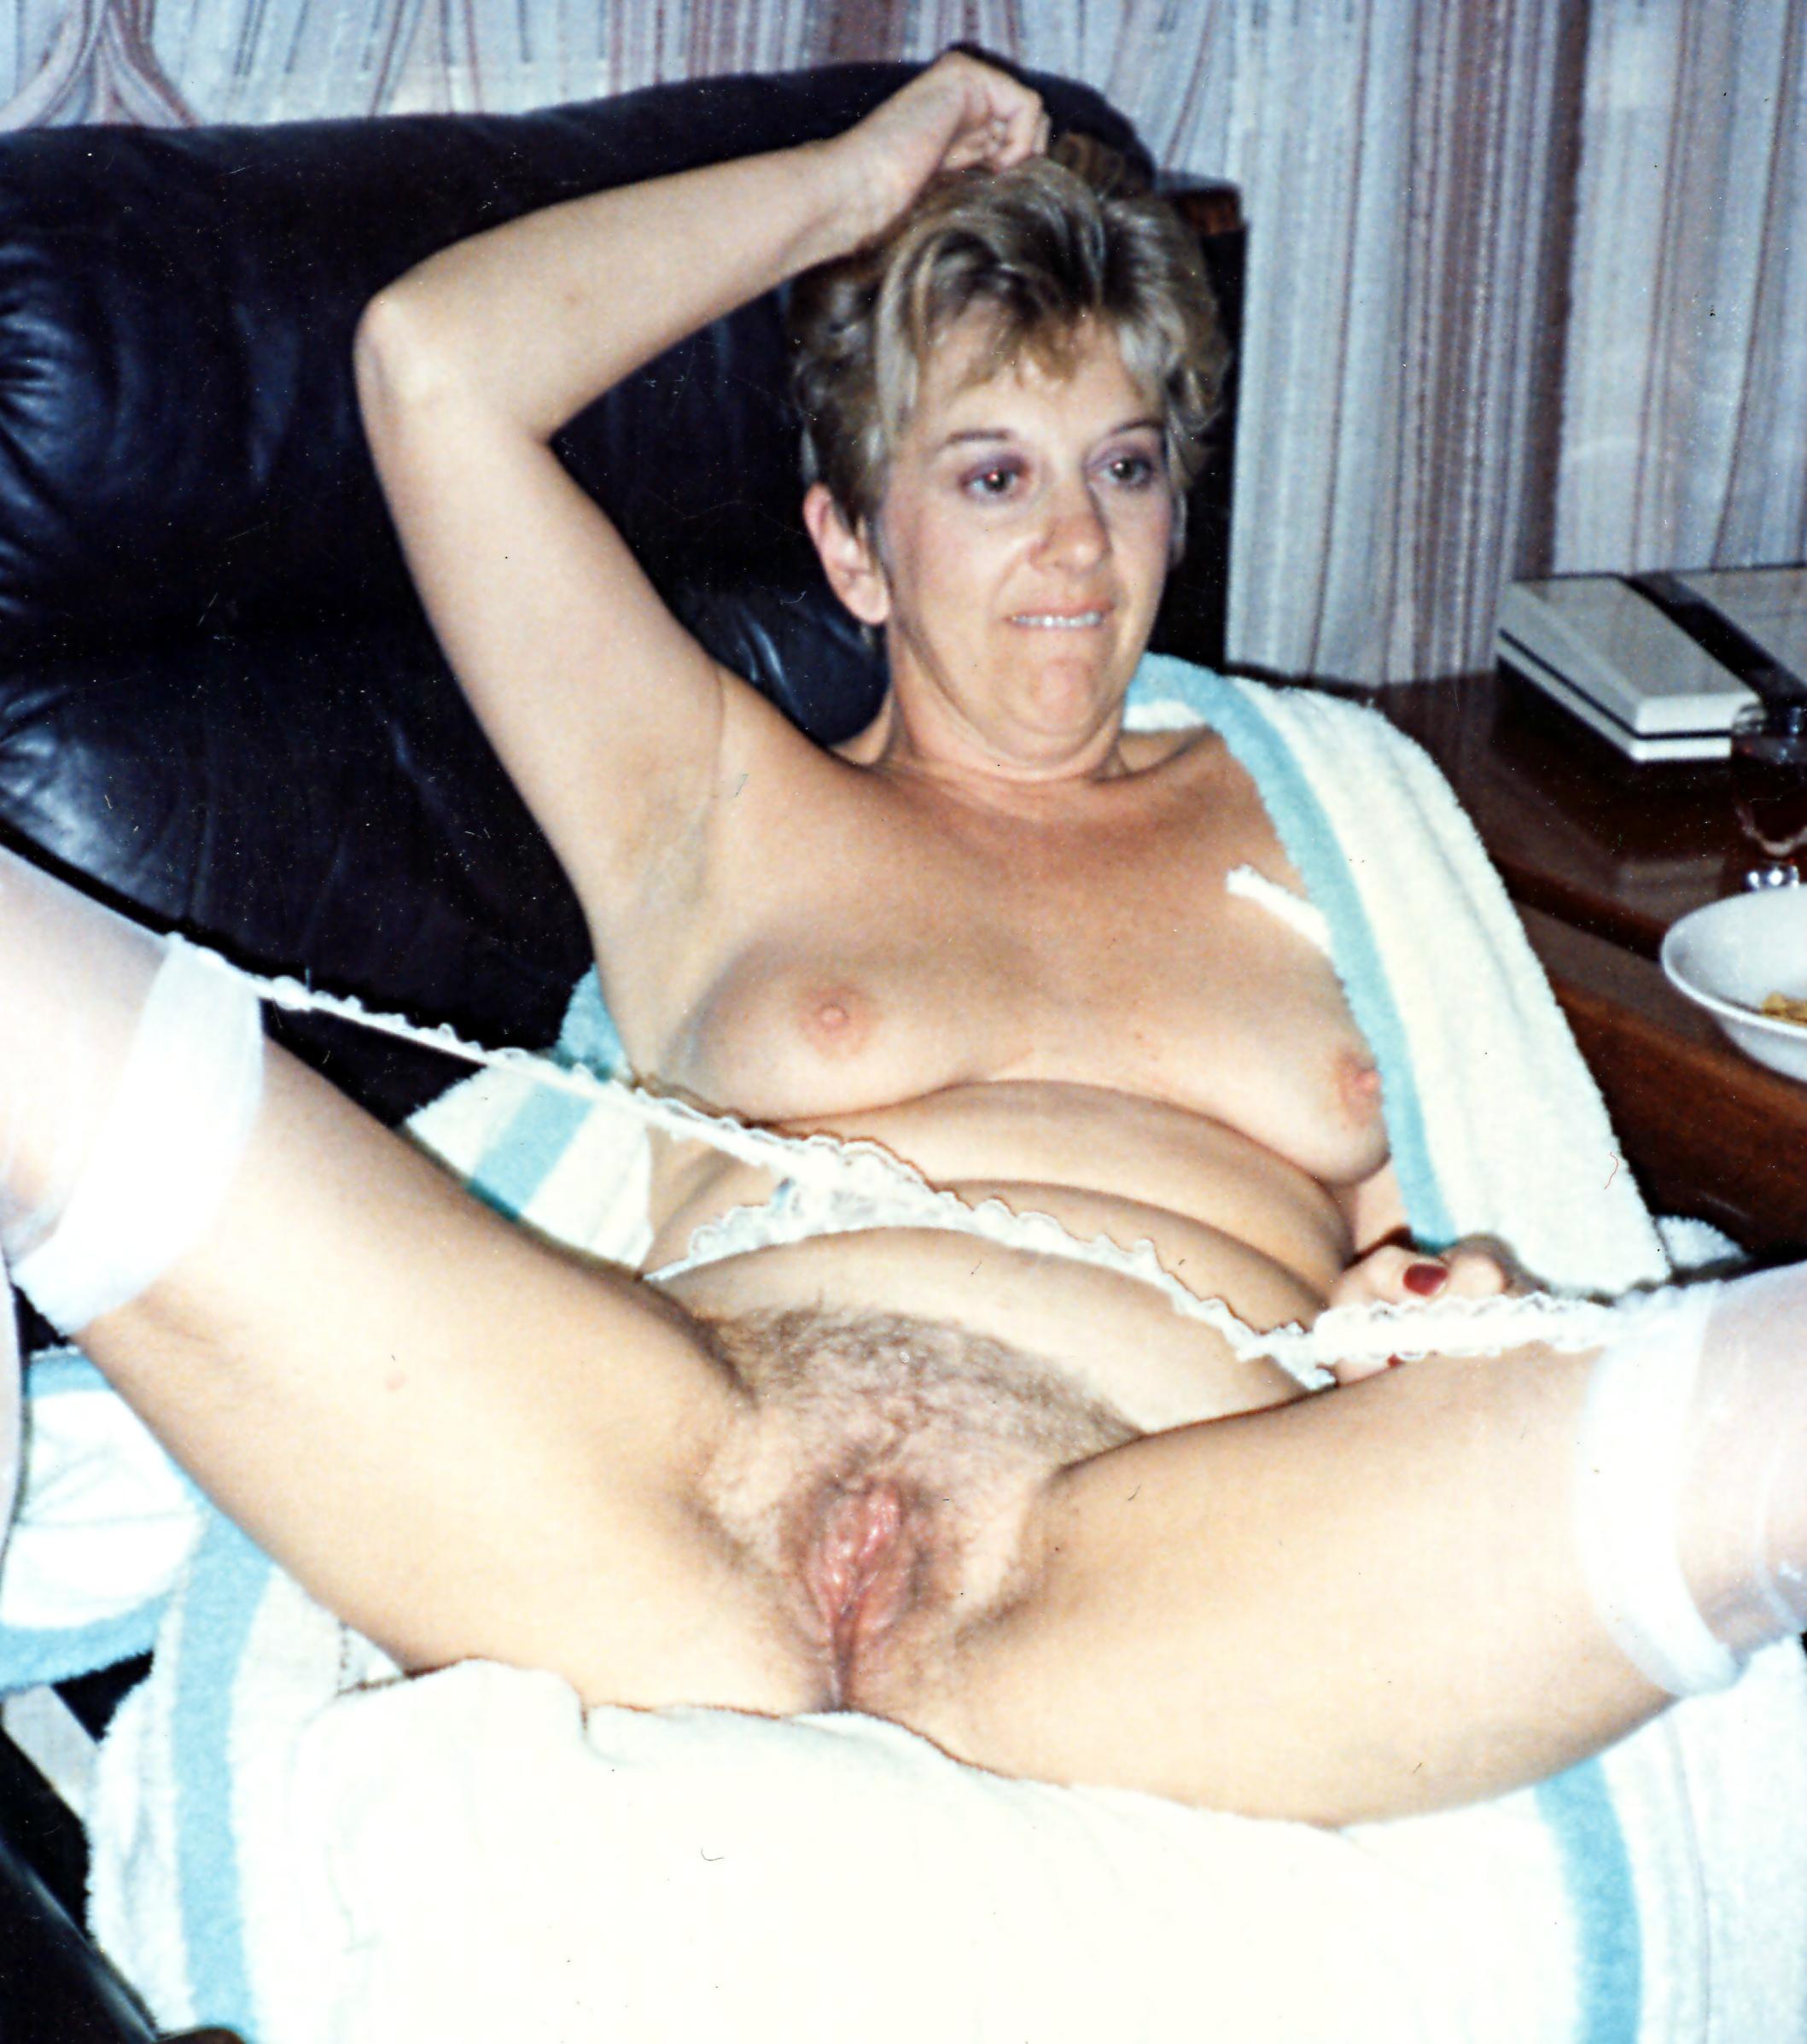 Free Nude Polaroids - Show Me Your Wife: Remember Polaroid Cameras